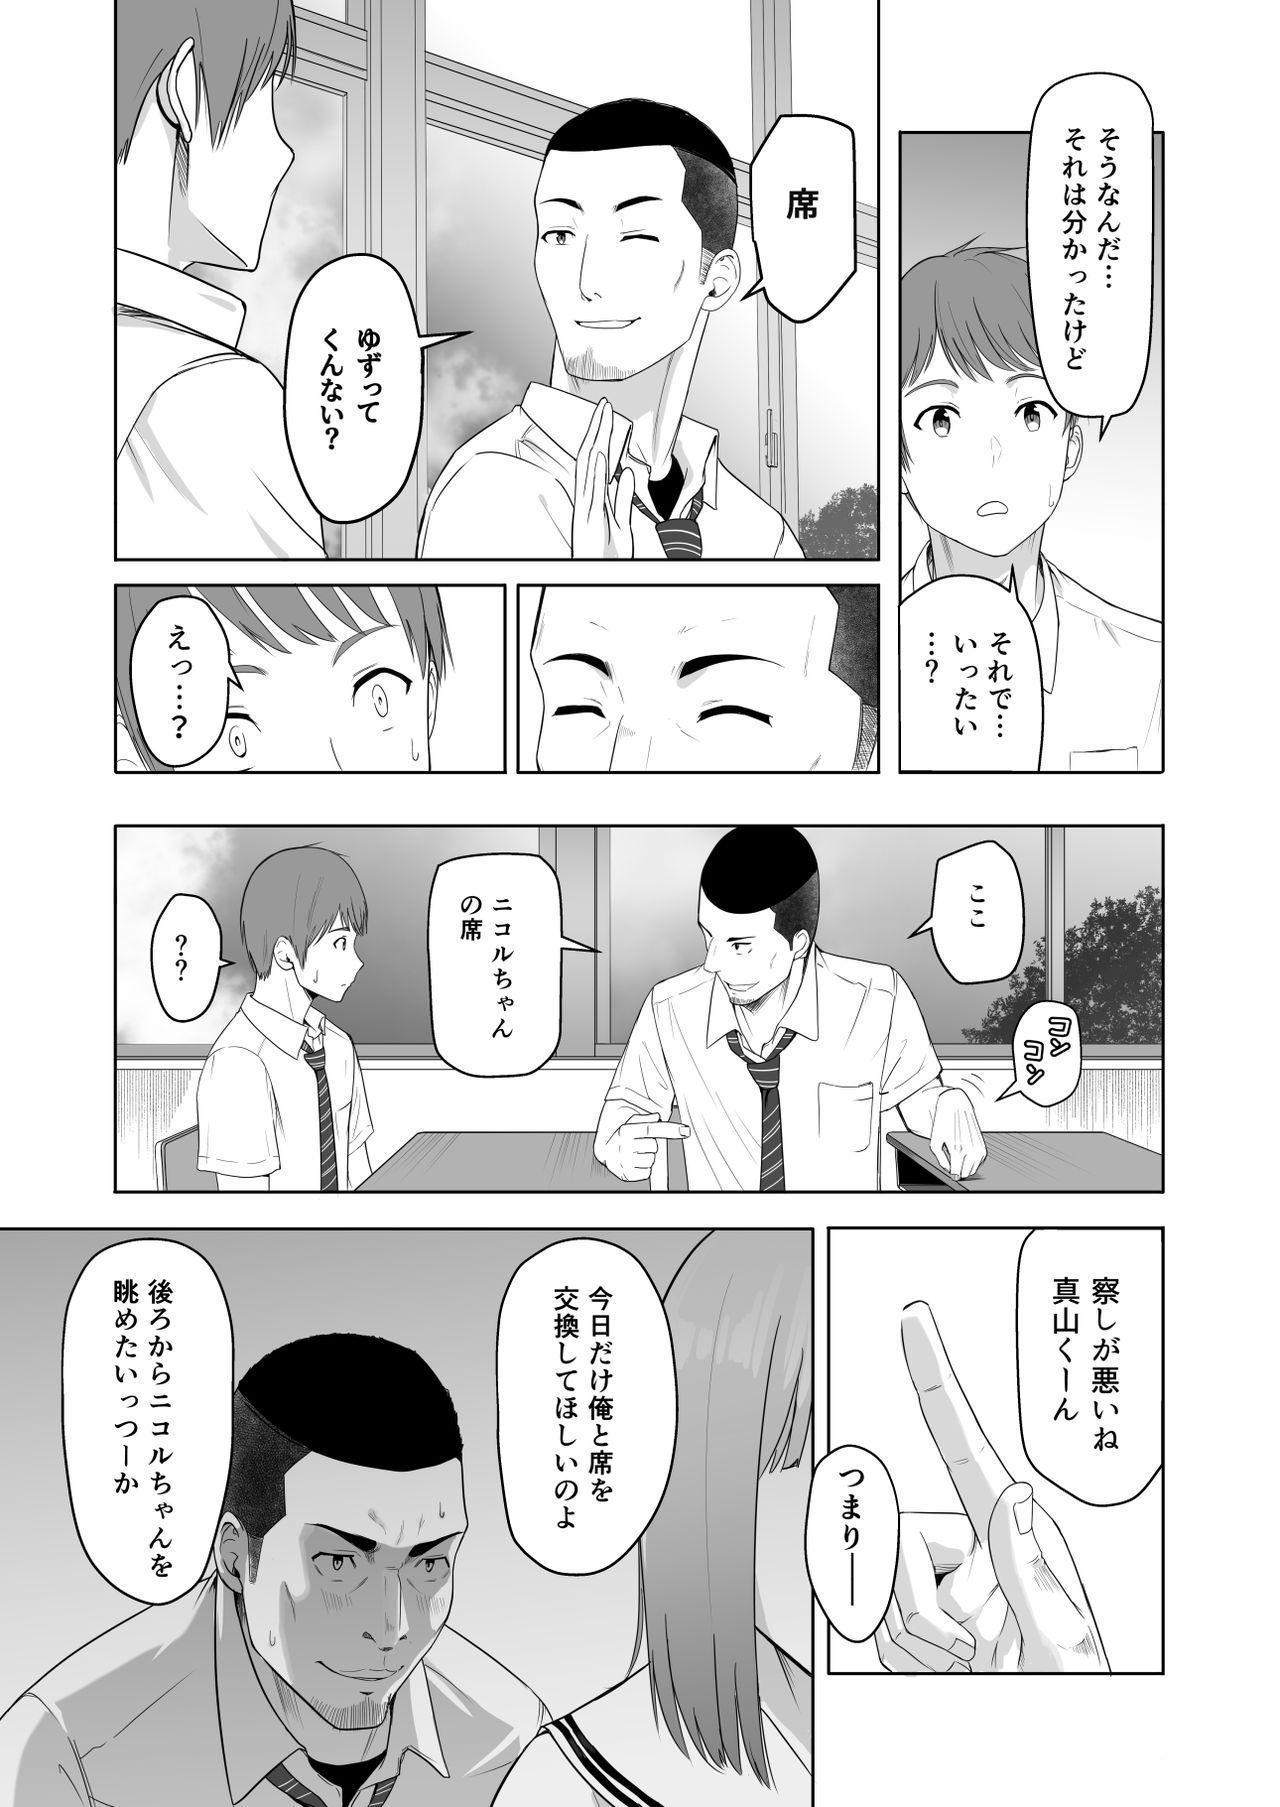 Kimi ga Tame. 2 Ichikawa Inori 7